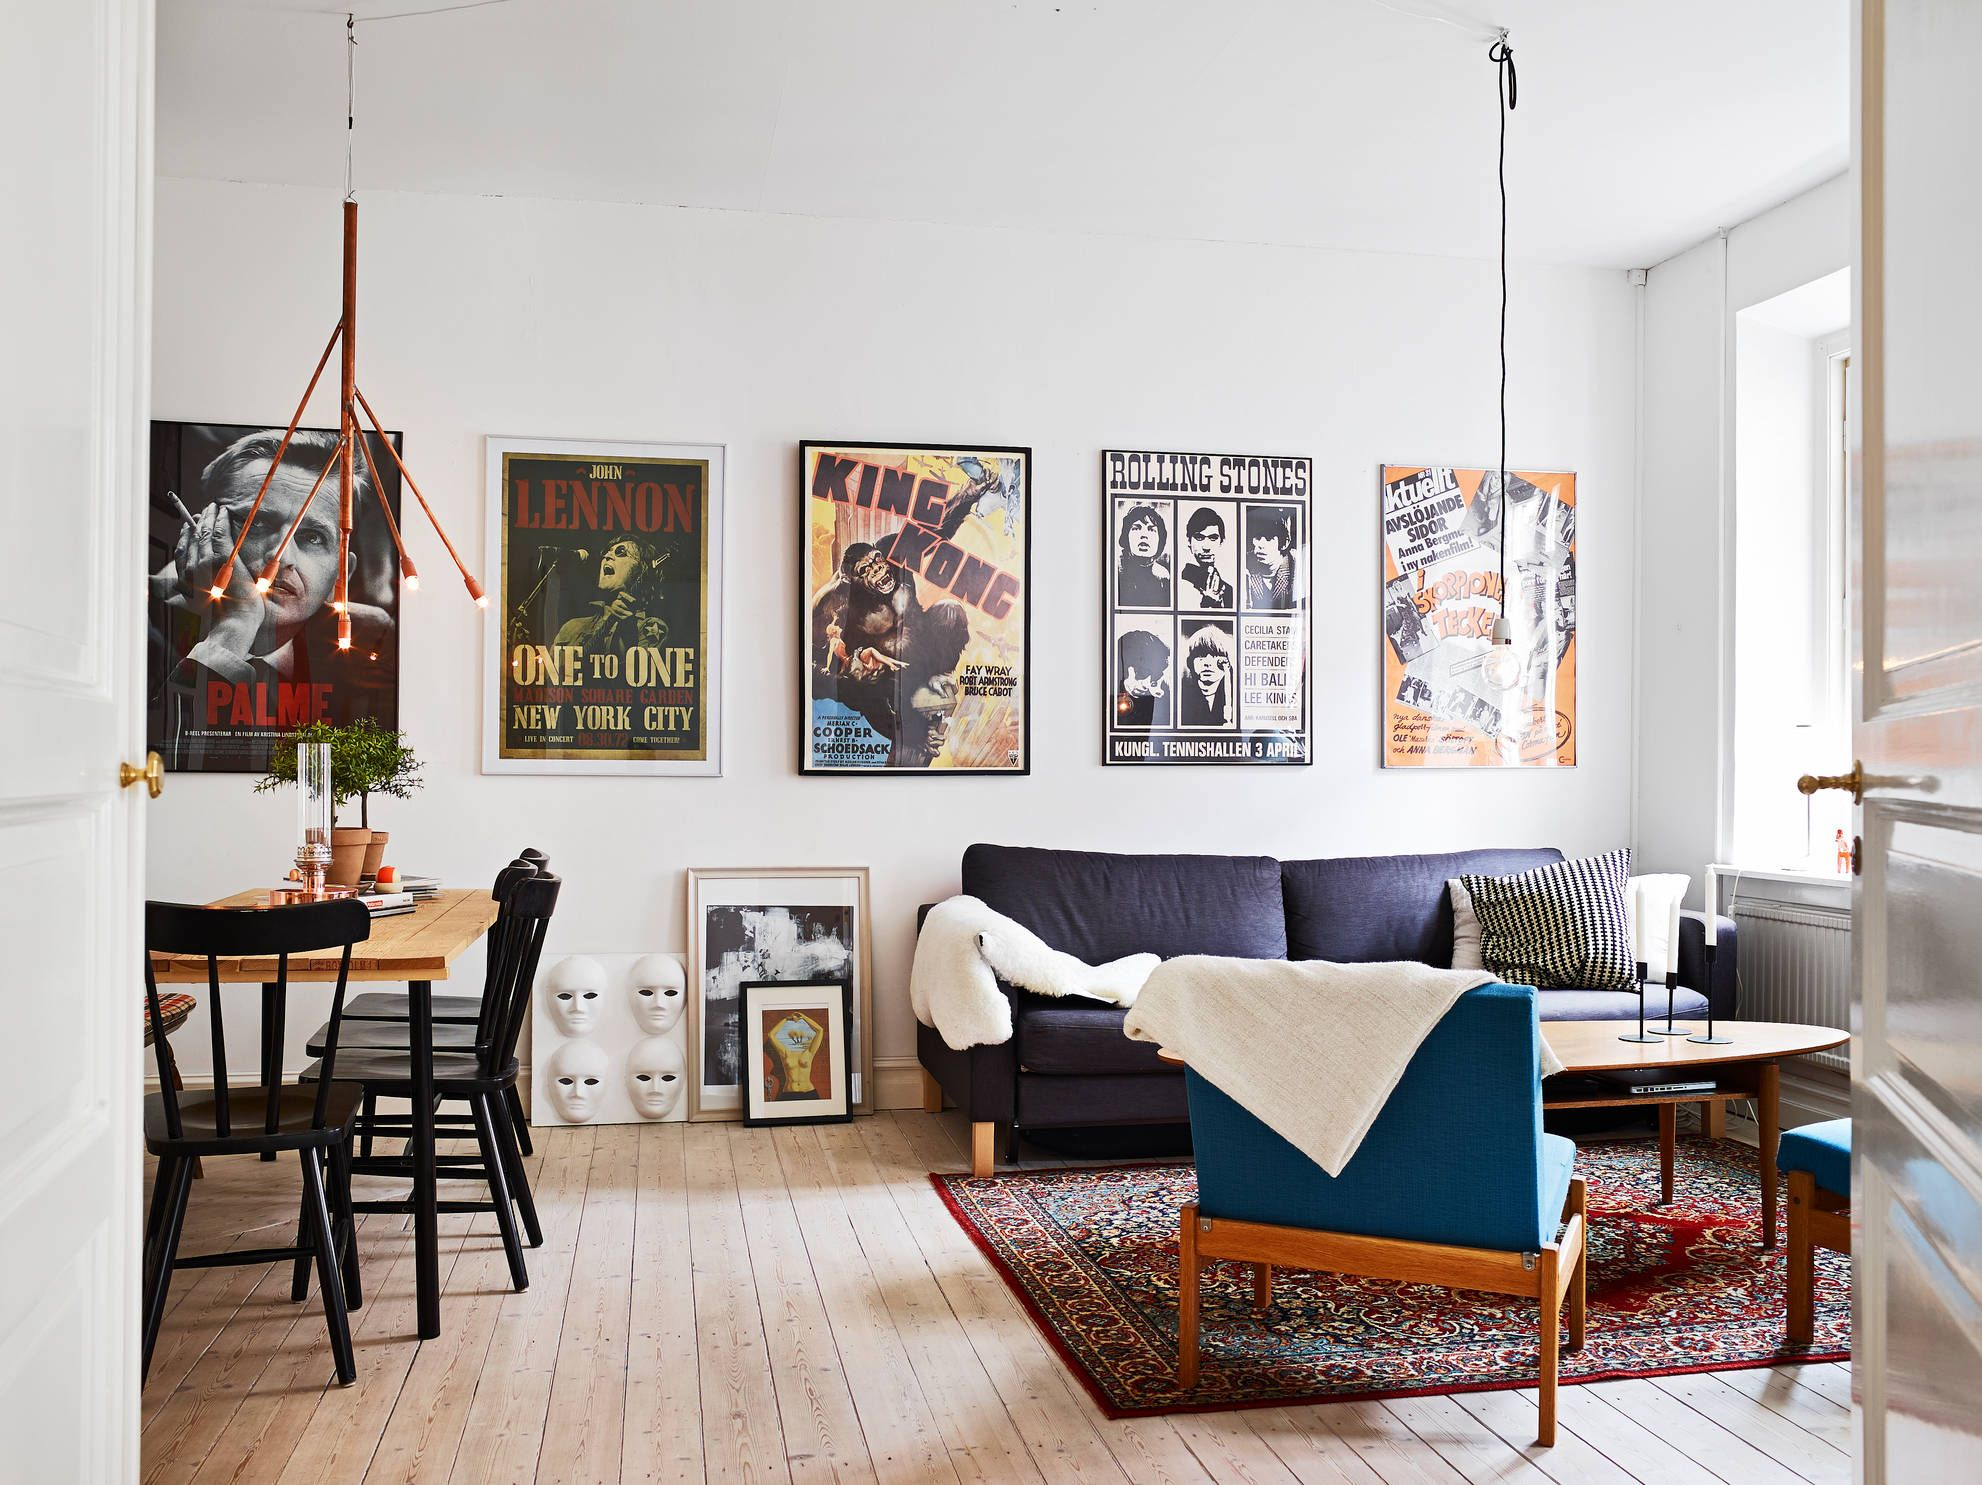 Pin by Miss Nahn on HOME / Living room | Pinterest | Living rooms ...